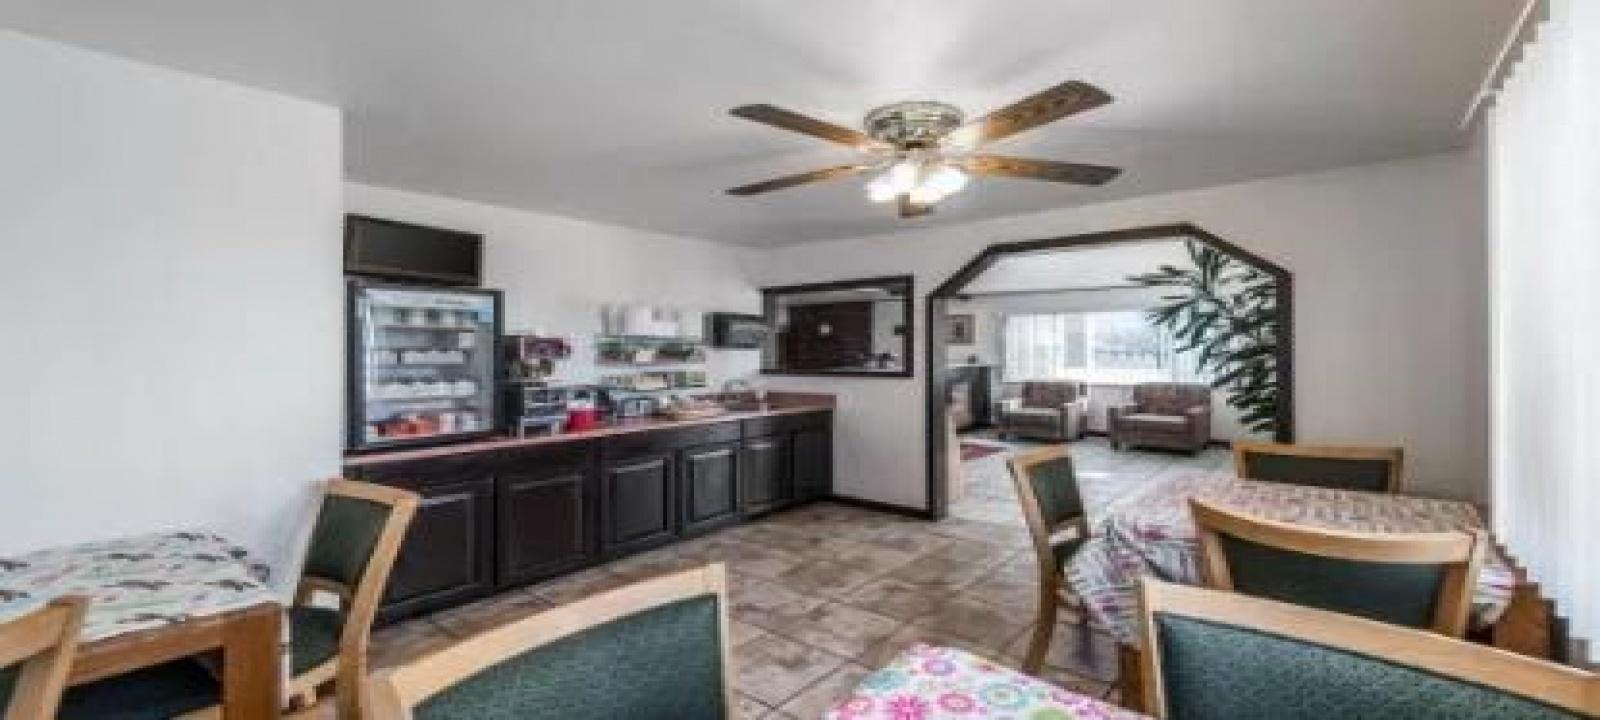 Brush, Colorado, ,North American Properties,For Sale,1017